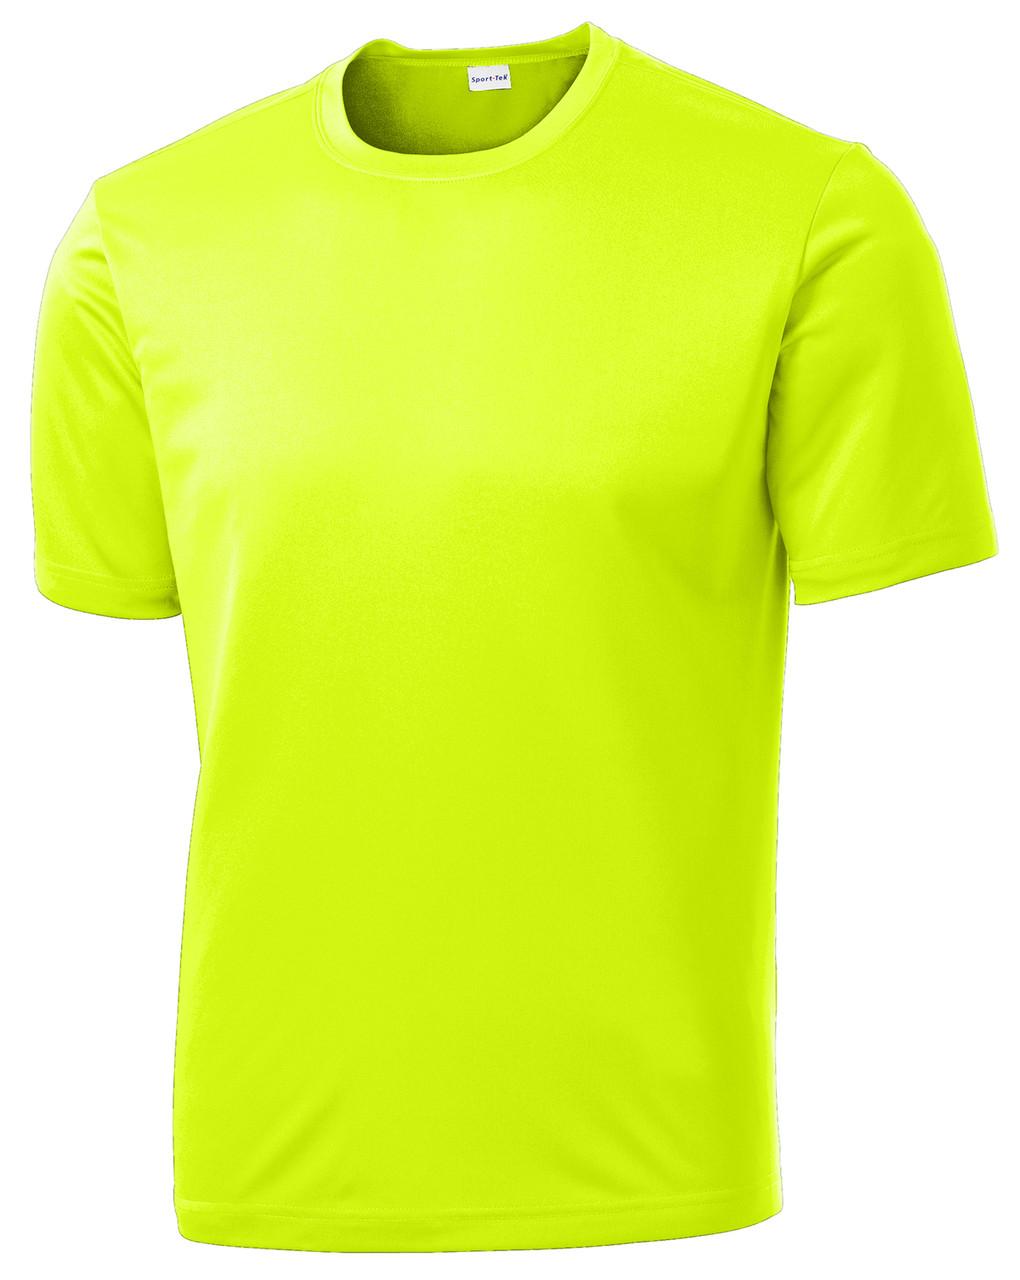 Neon Yellow Performance 100% Polyester T-Shirt